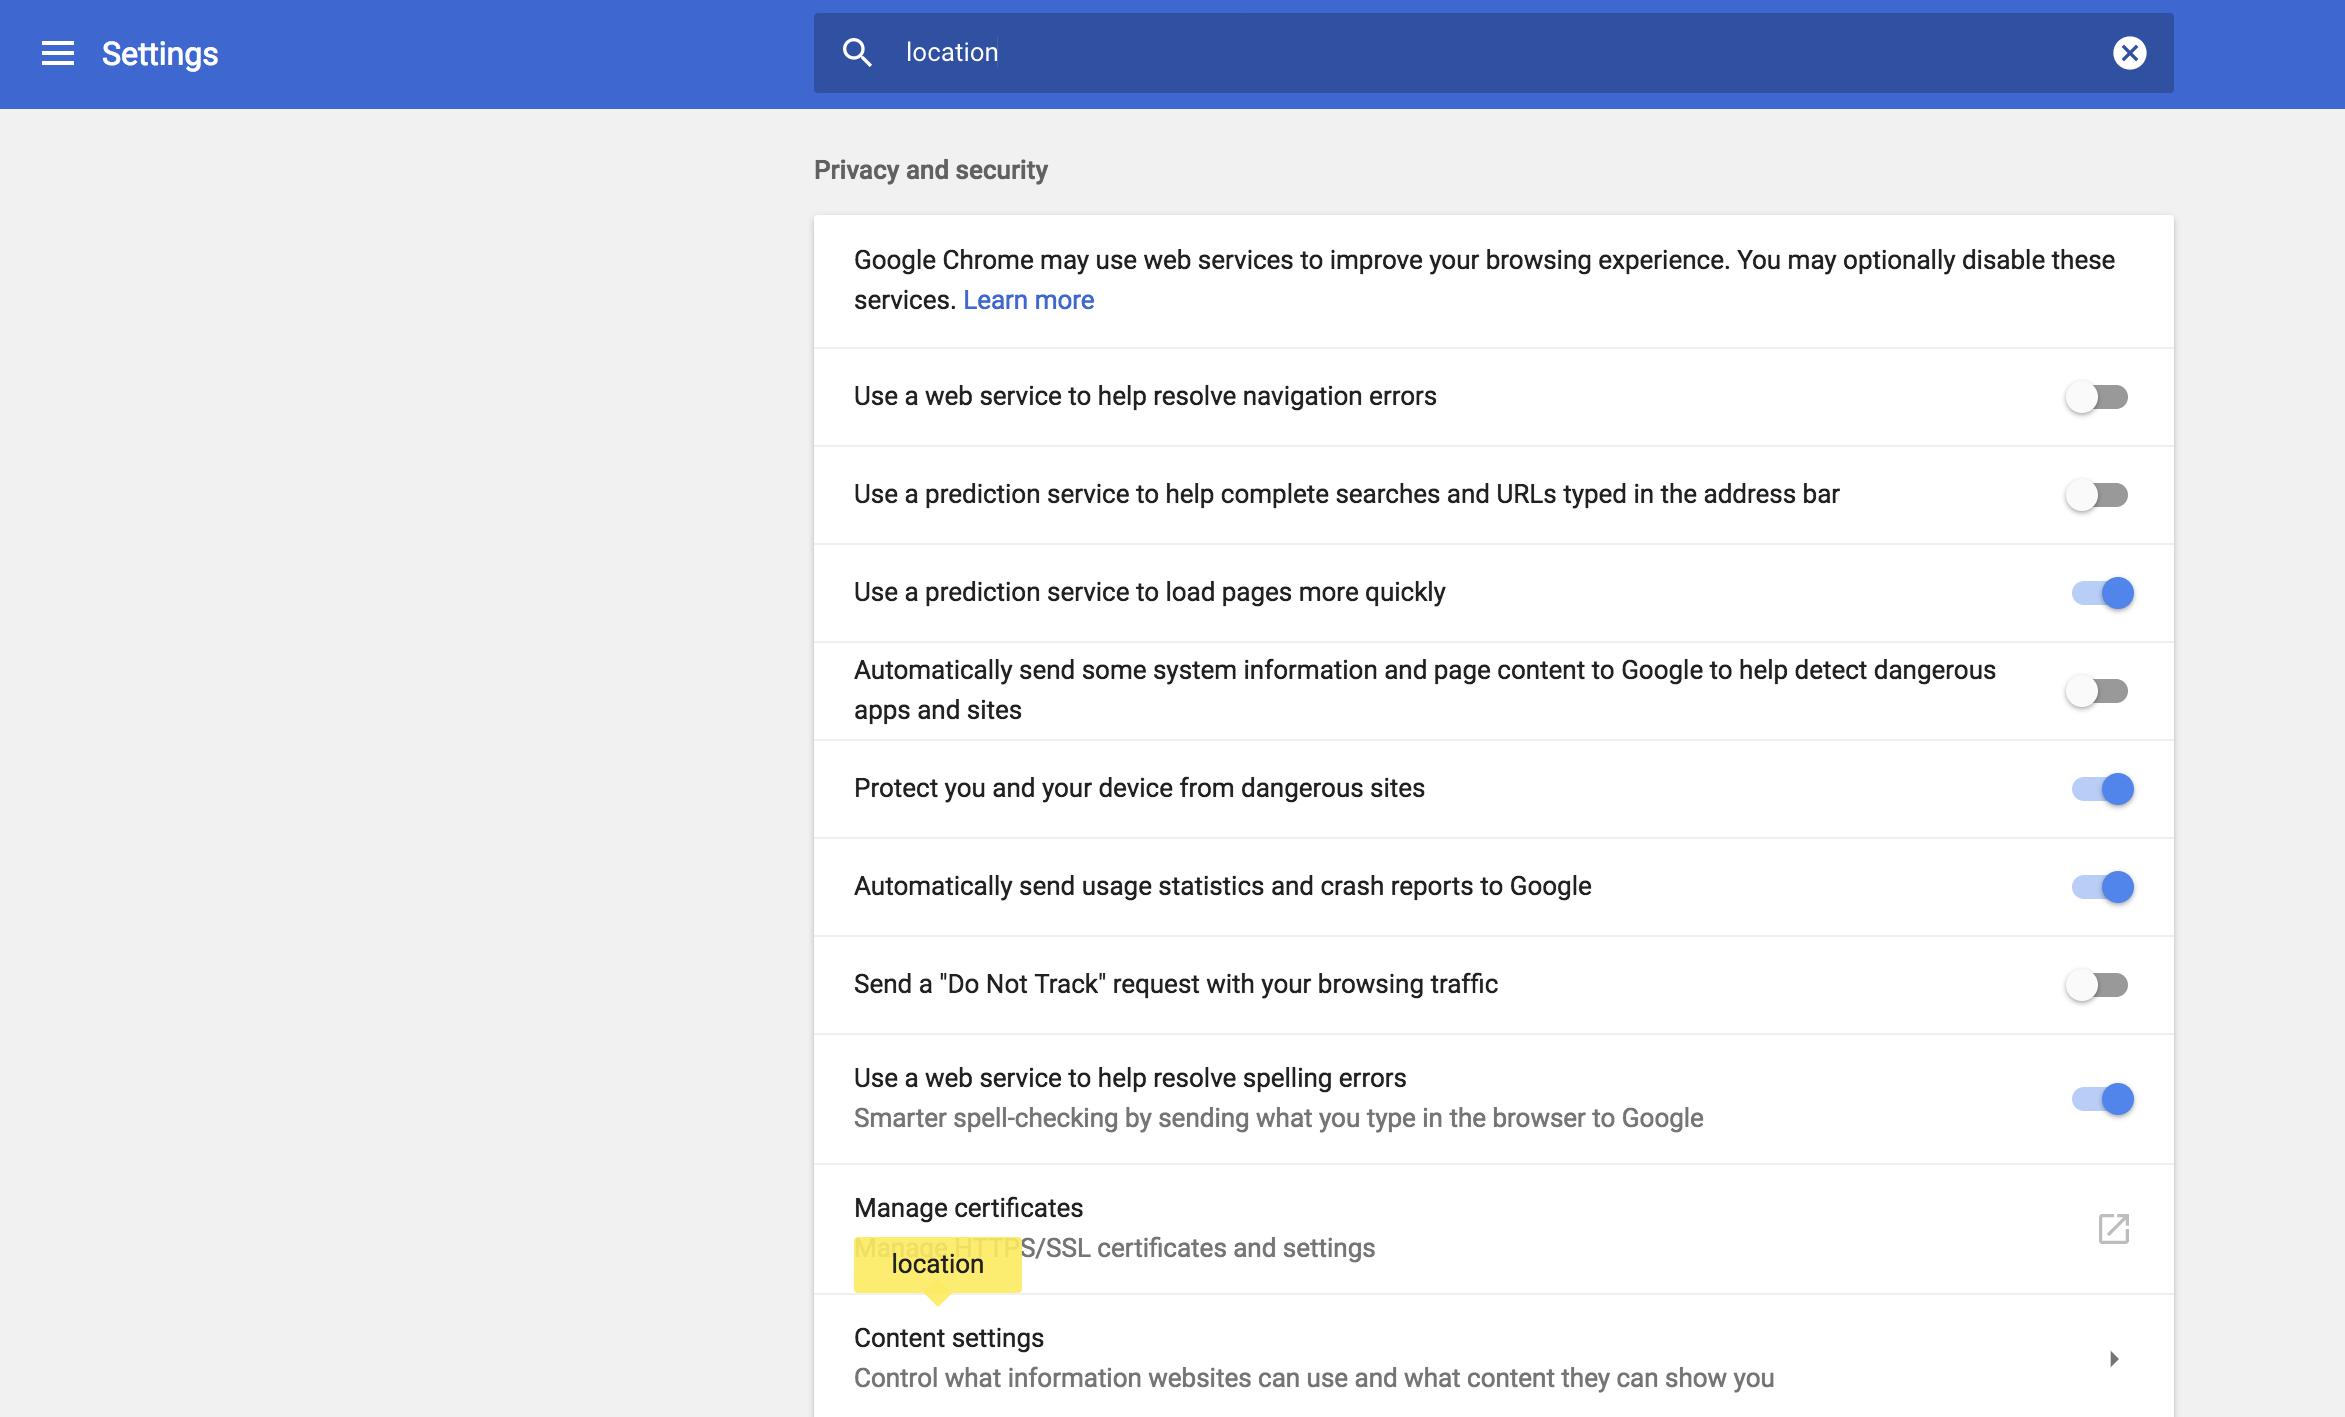 google chrome > settings > location search